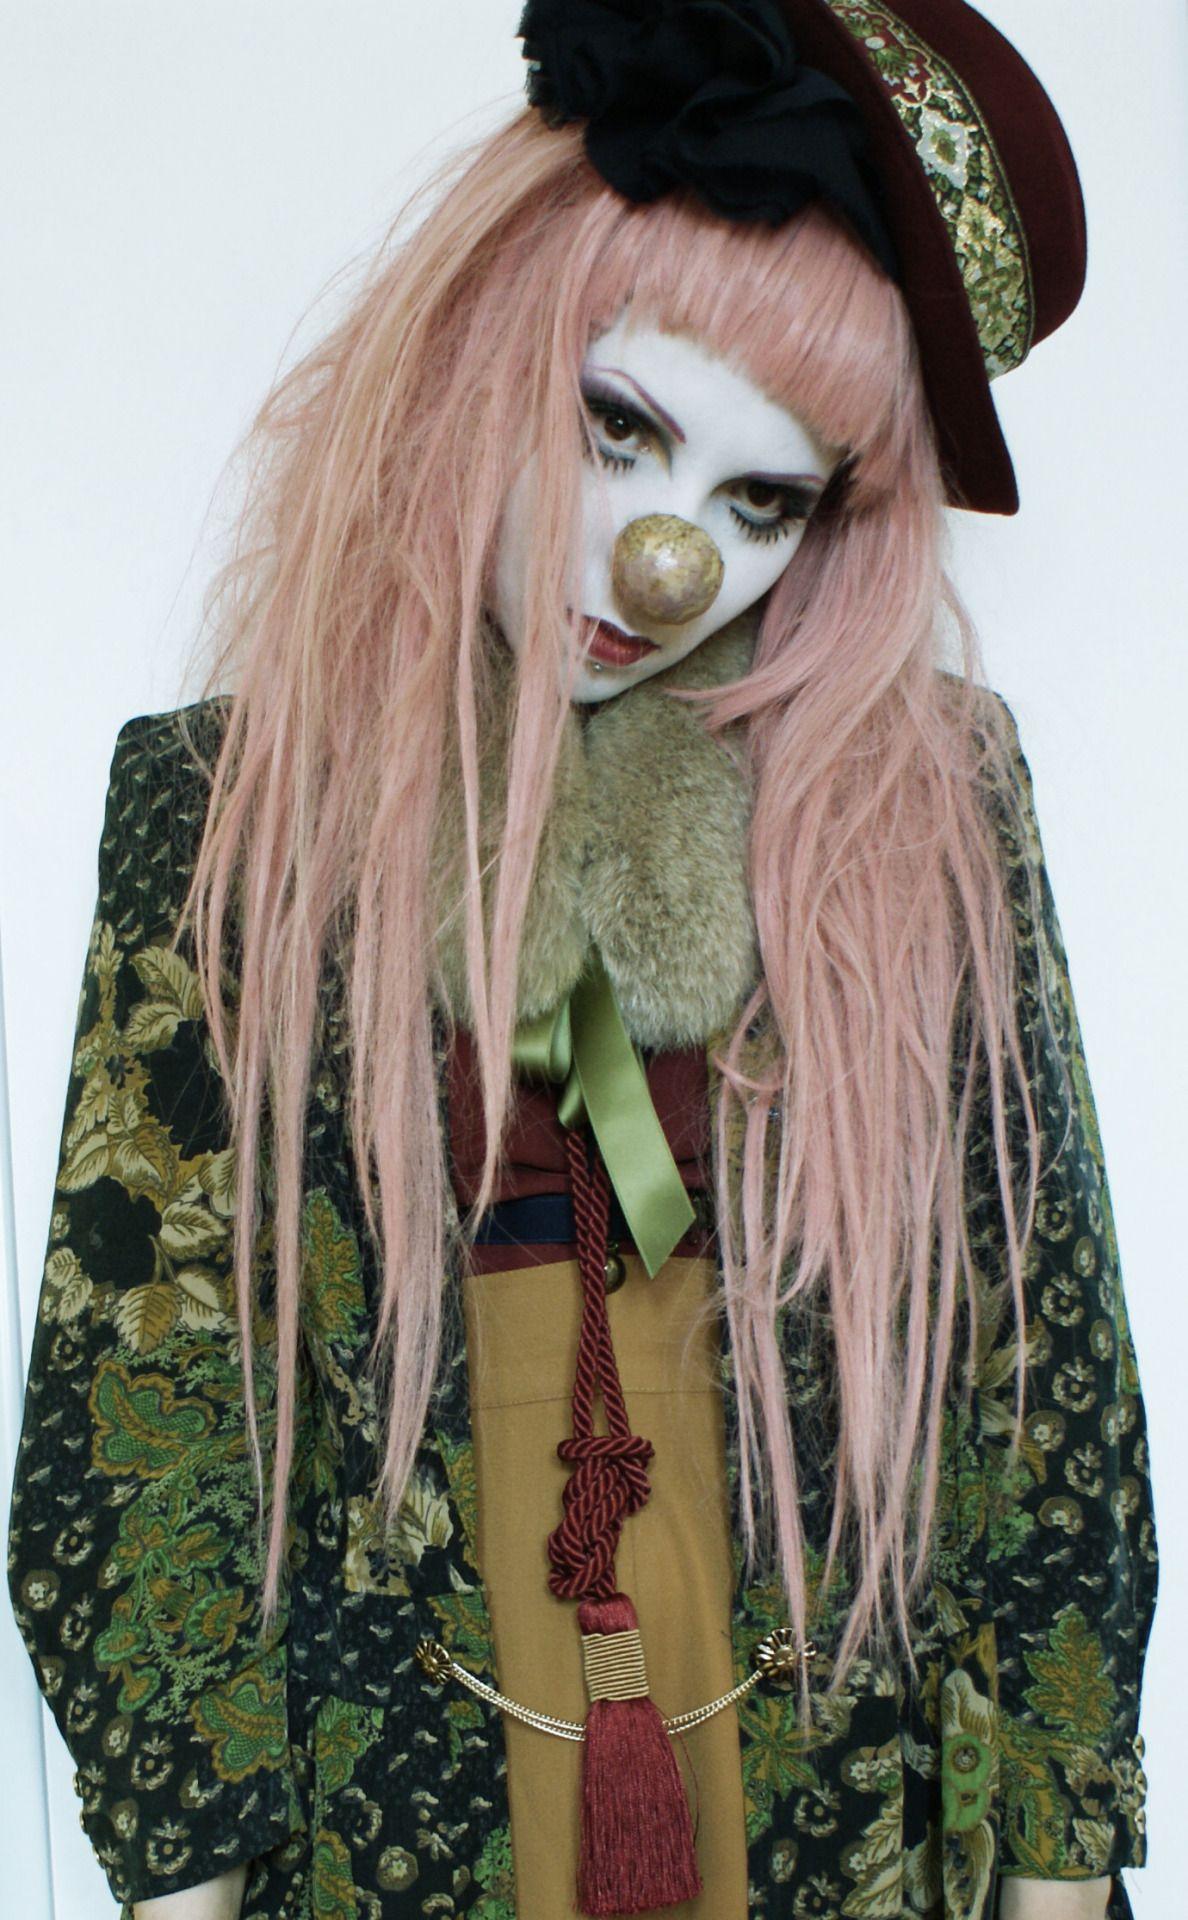 DIY Carneval Halloween I Karneval Fasching Kostüm | пипл в ... - photo#23